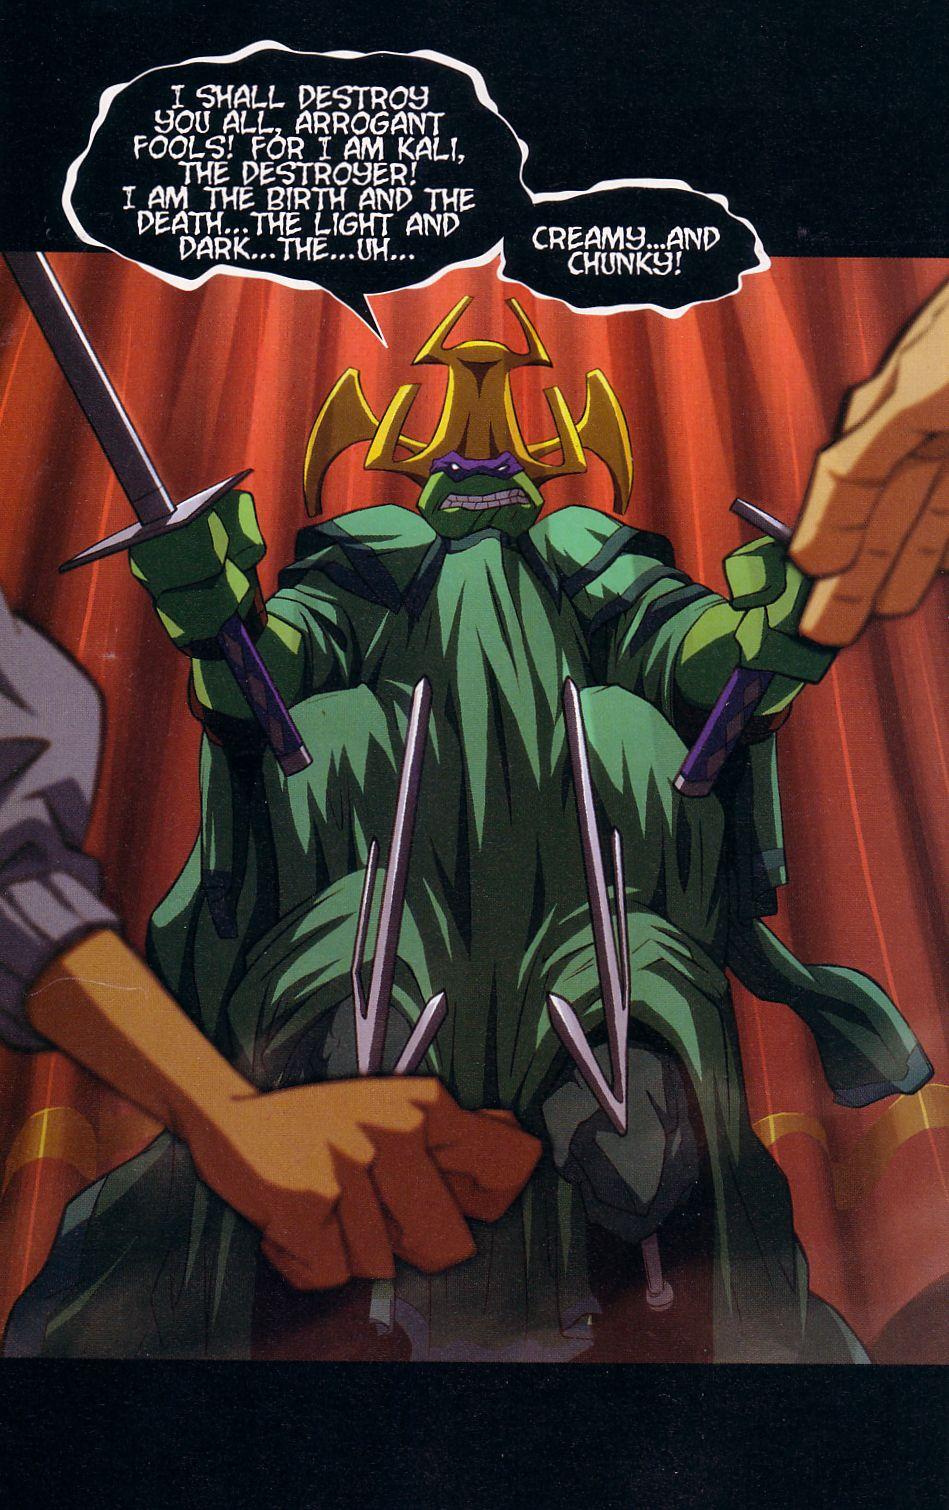 Teenage Mutant Ninja Turtles (2003) chap 7 pic 20